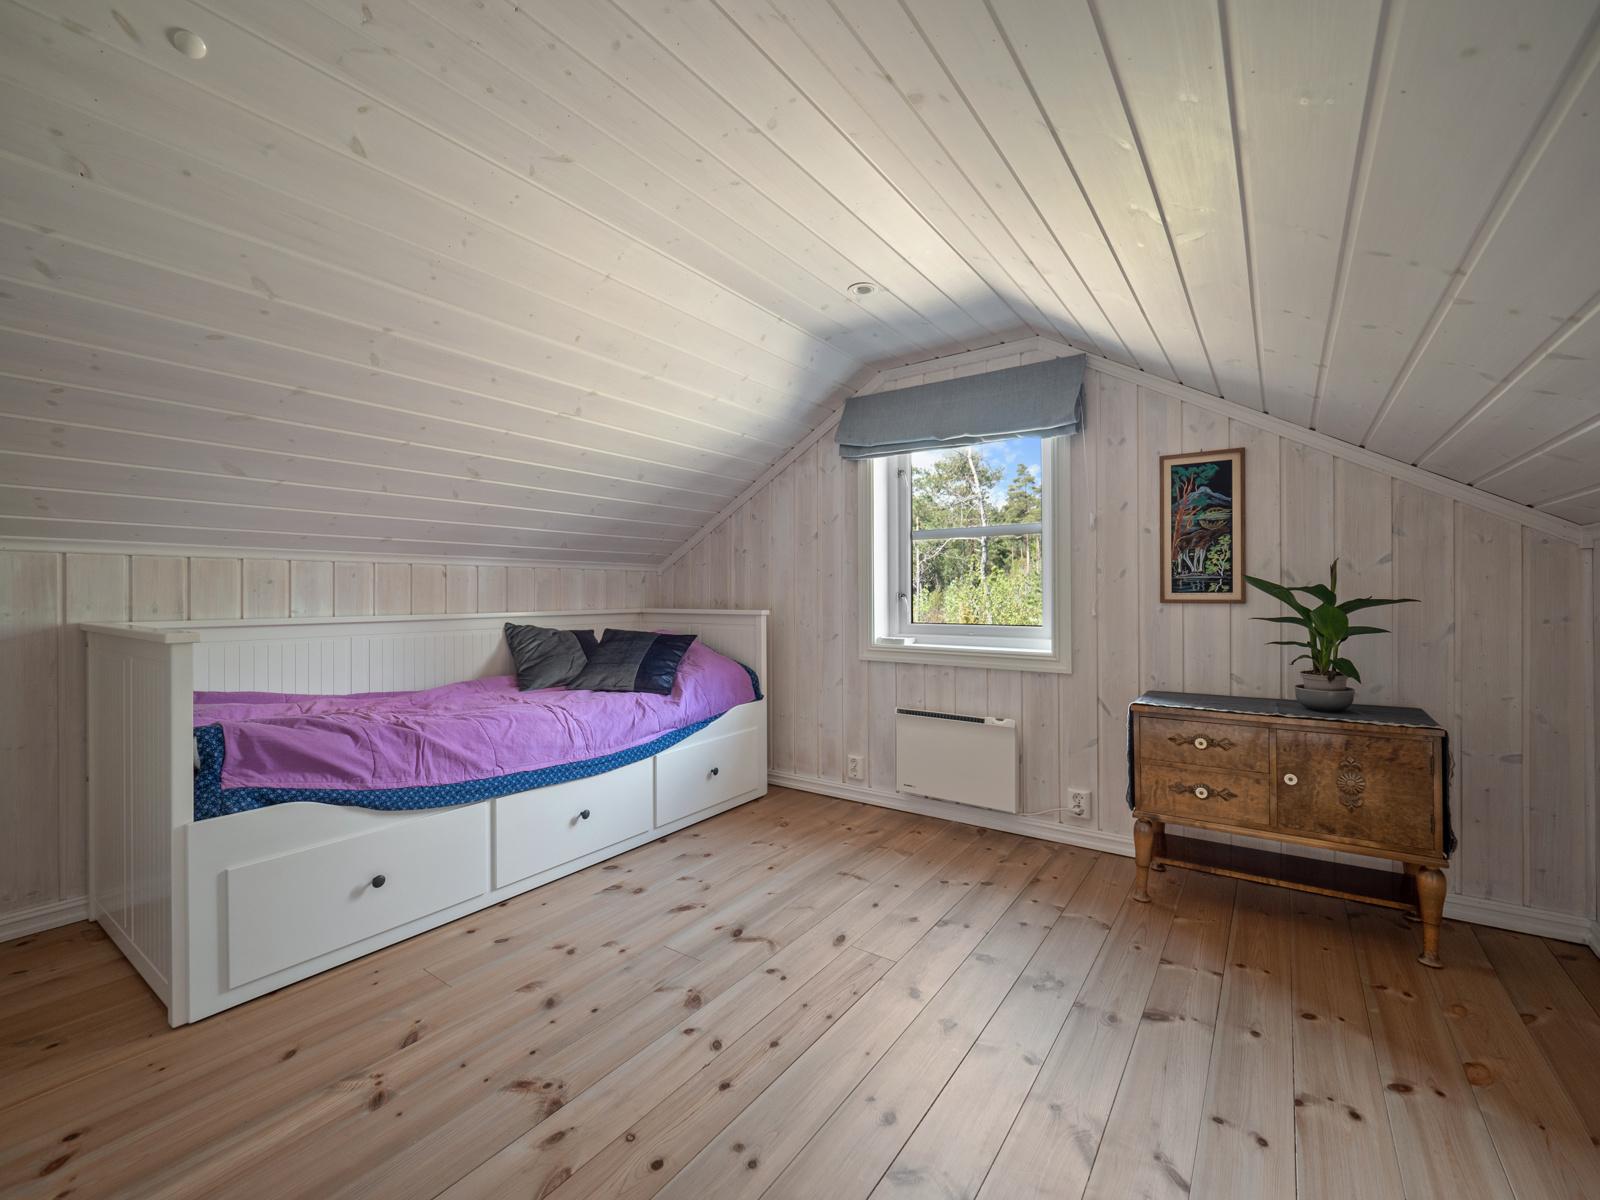 Innredet rom I i loftetasjen som benyttes som soverom